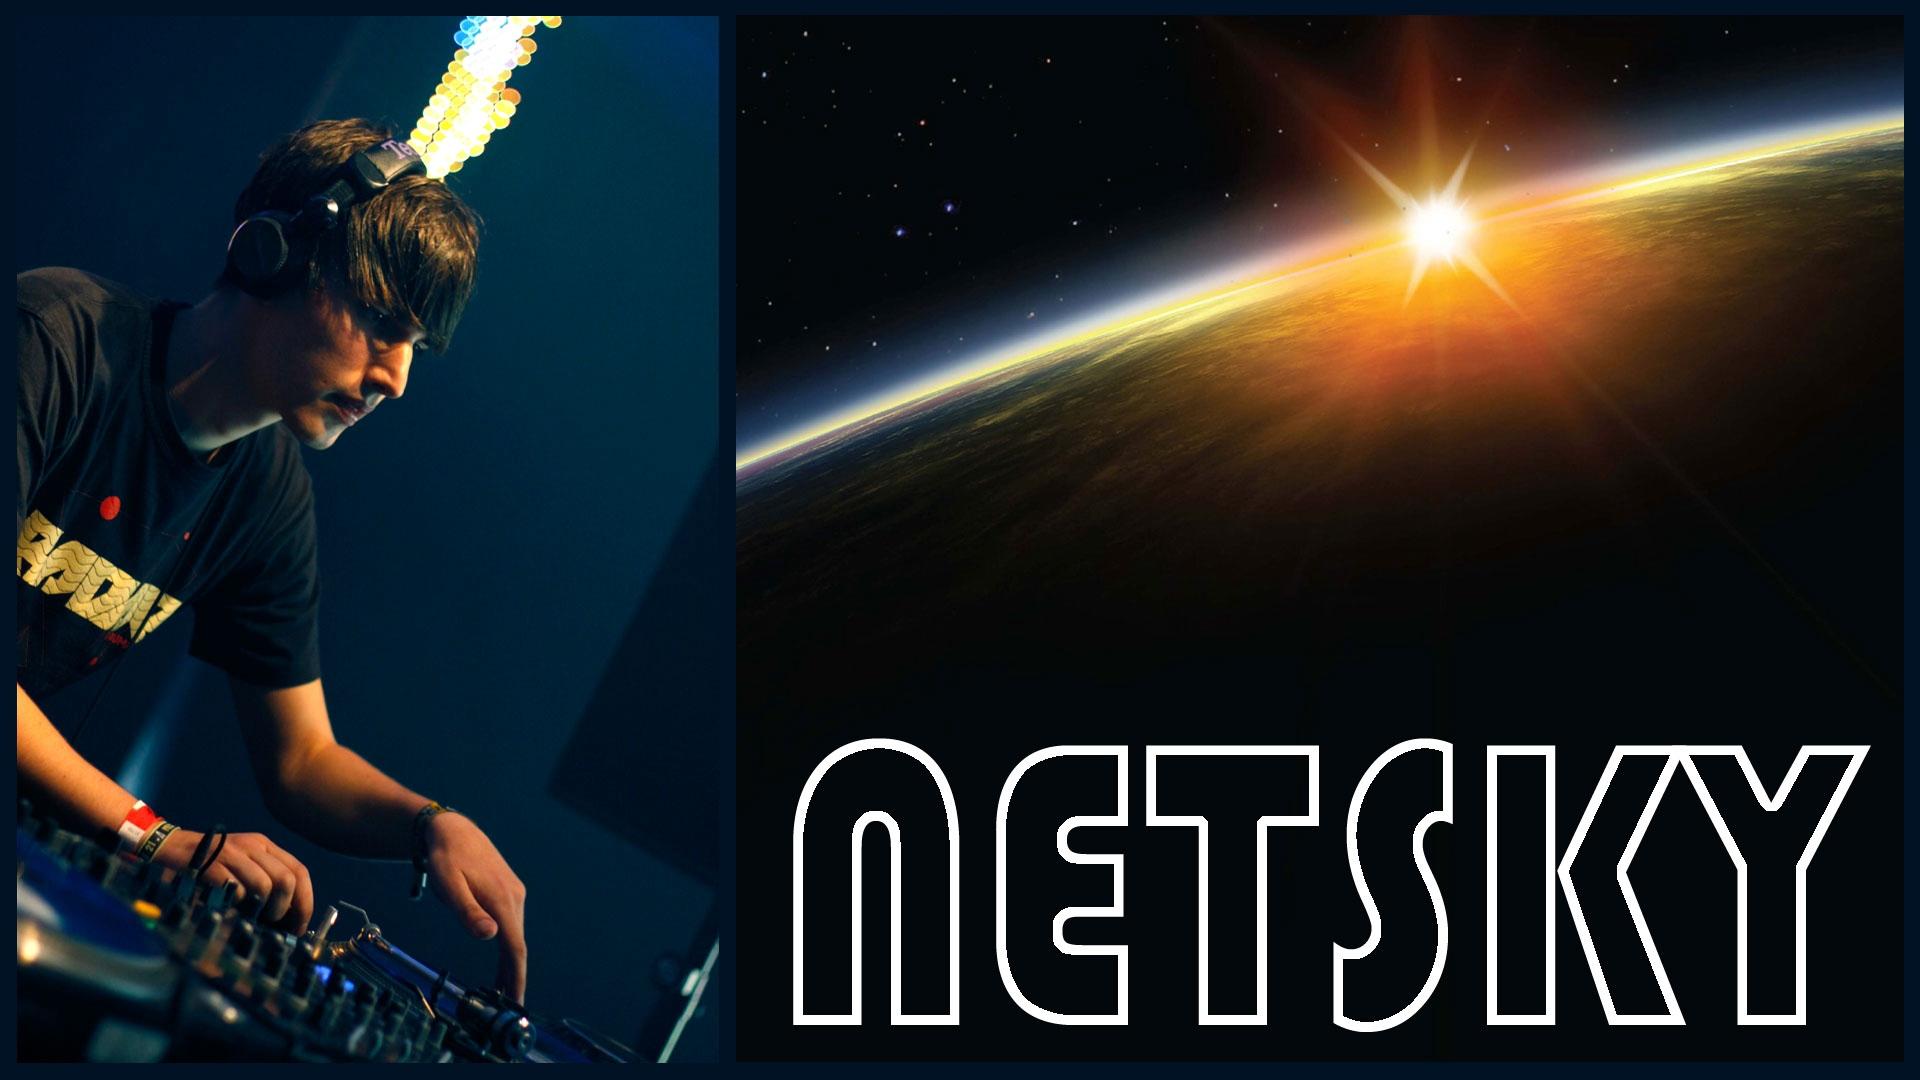 Netsky Man Earth Sun Space   Stock Photos Images HD 1920x1080